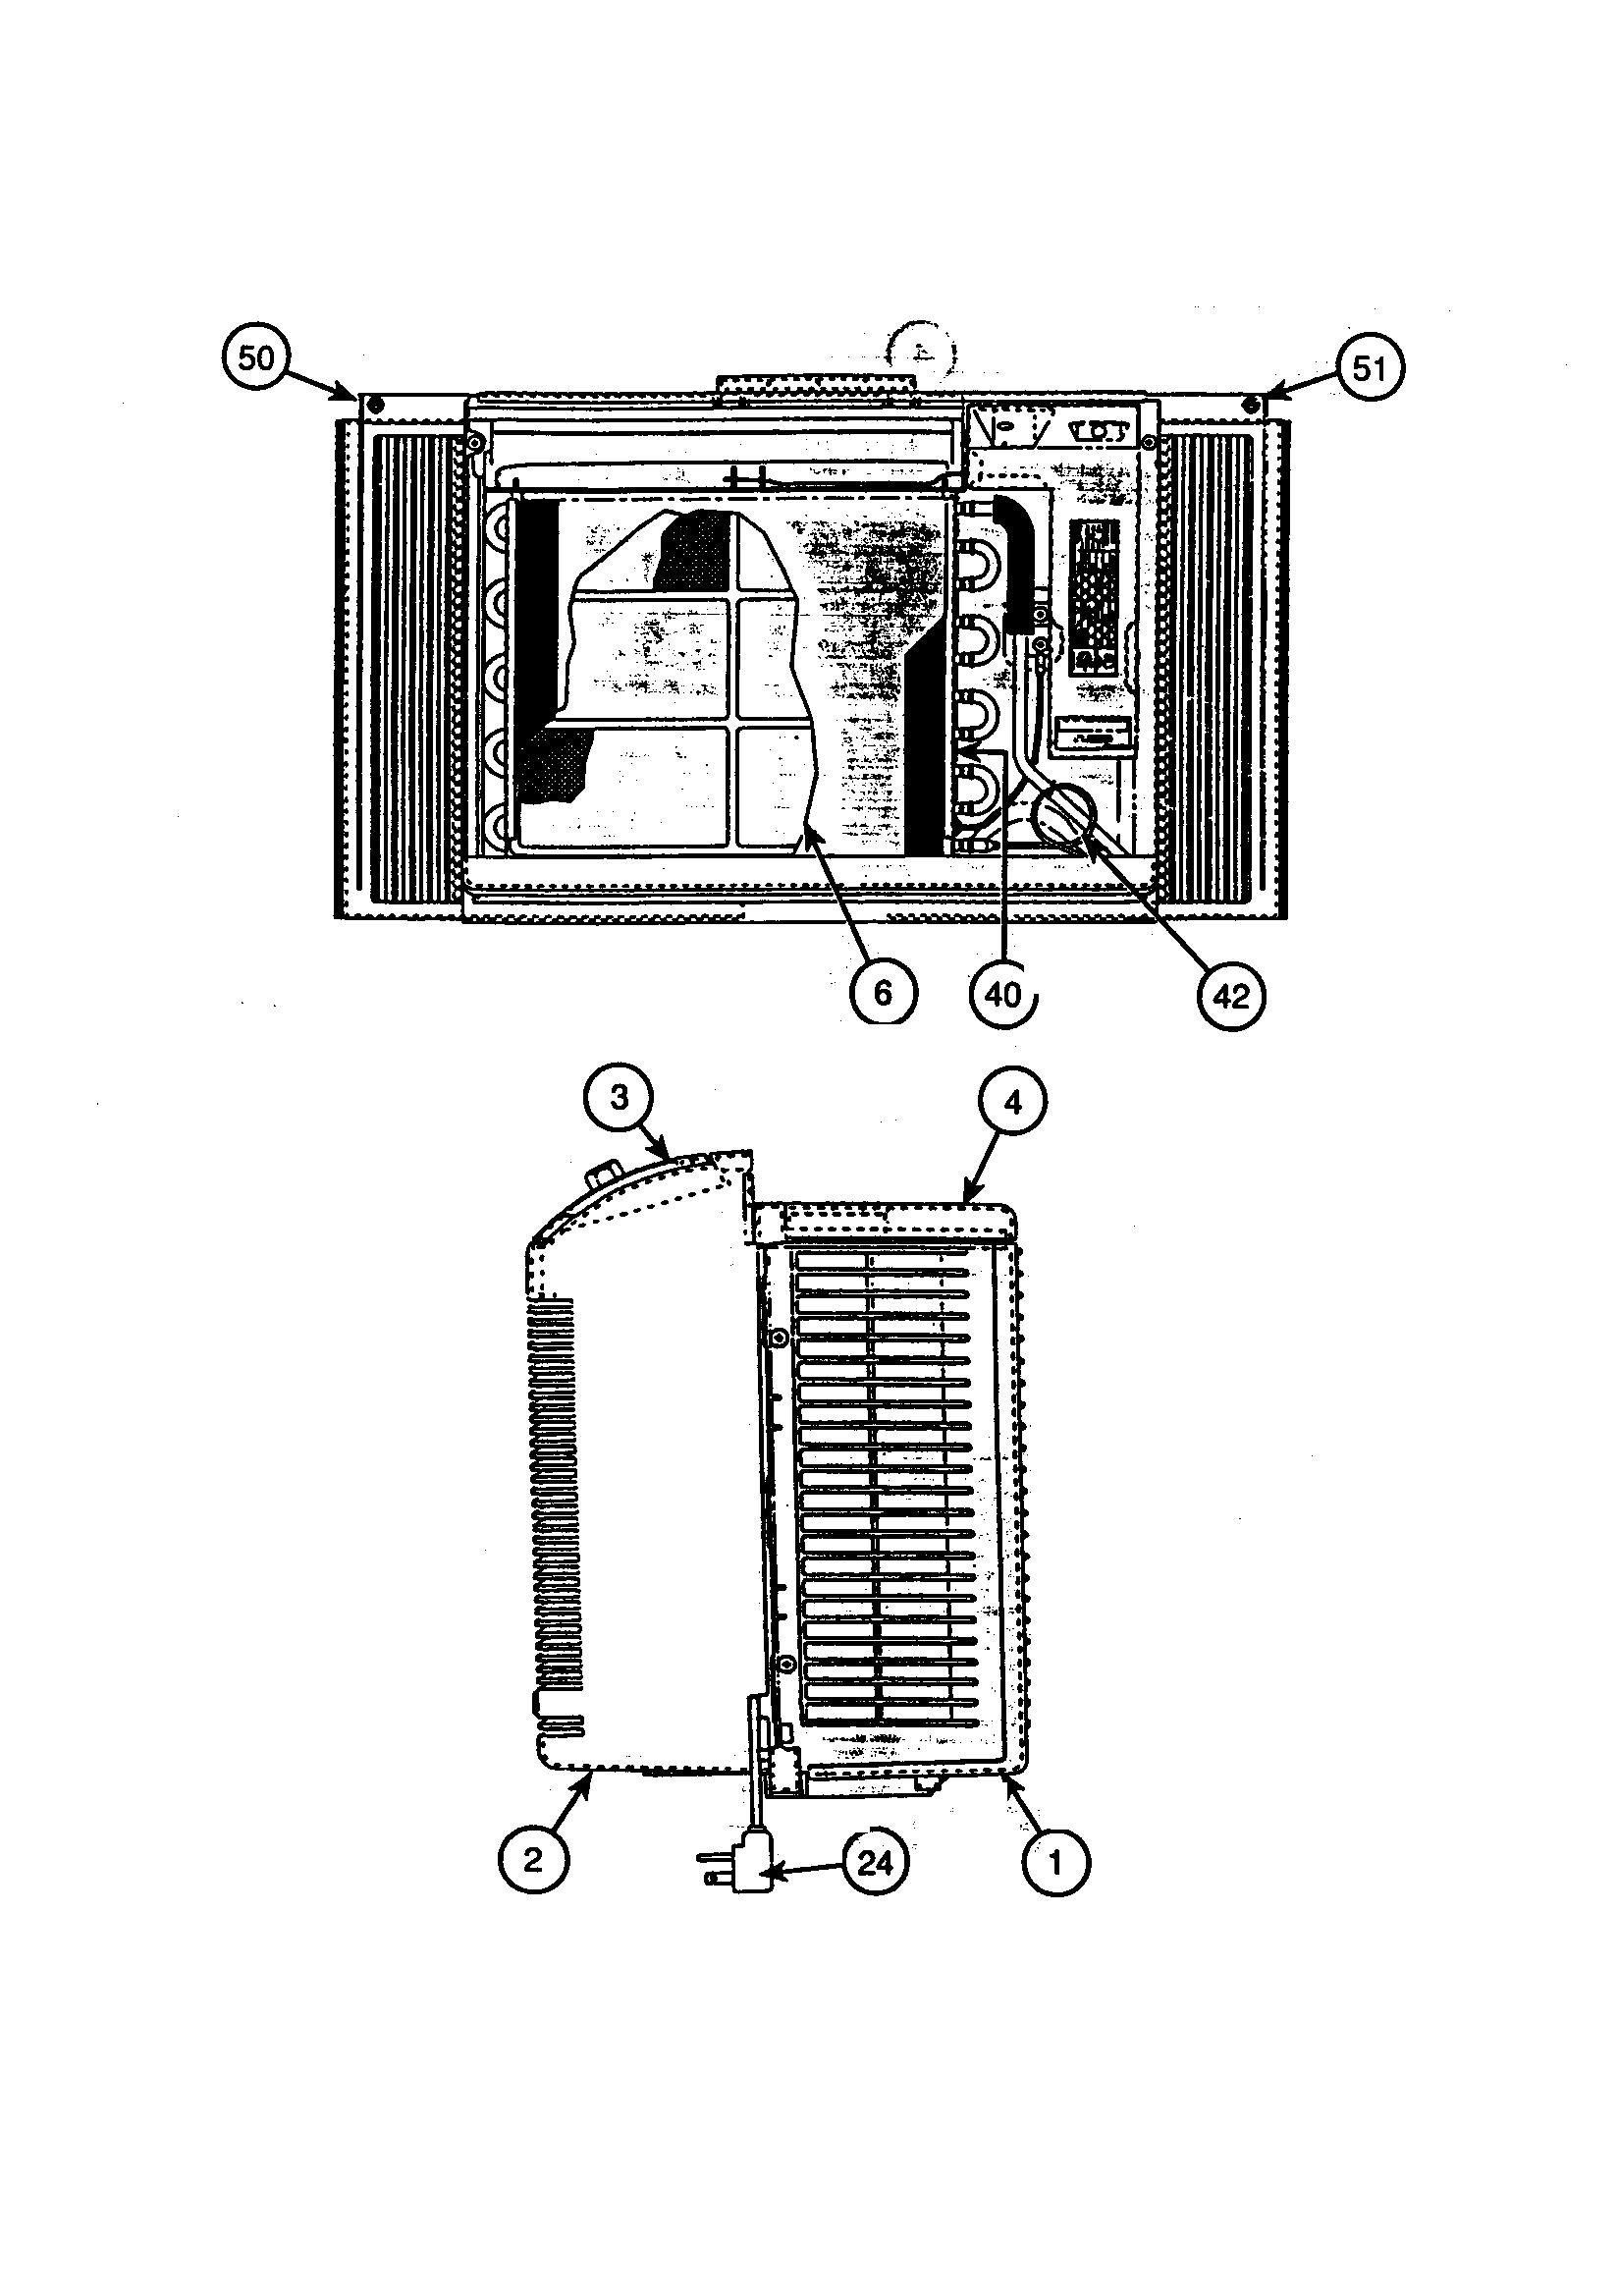 Carrier 30gb Chiller Wiring Diagram : 35 Wiring Diagram